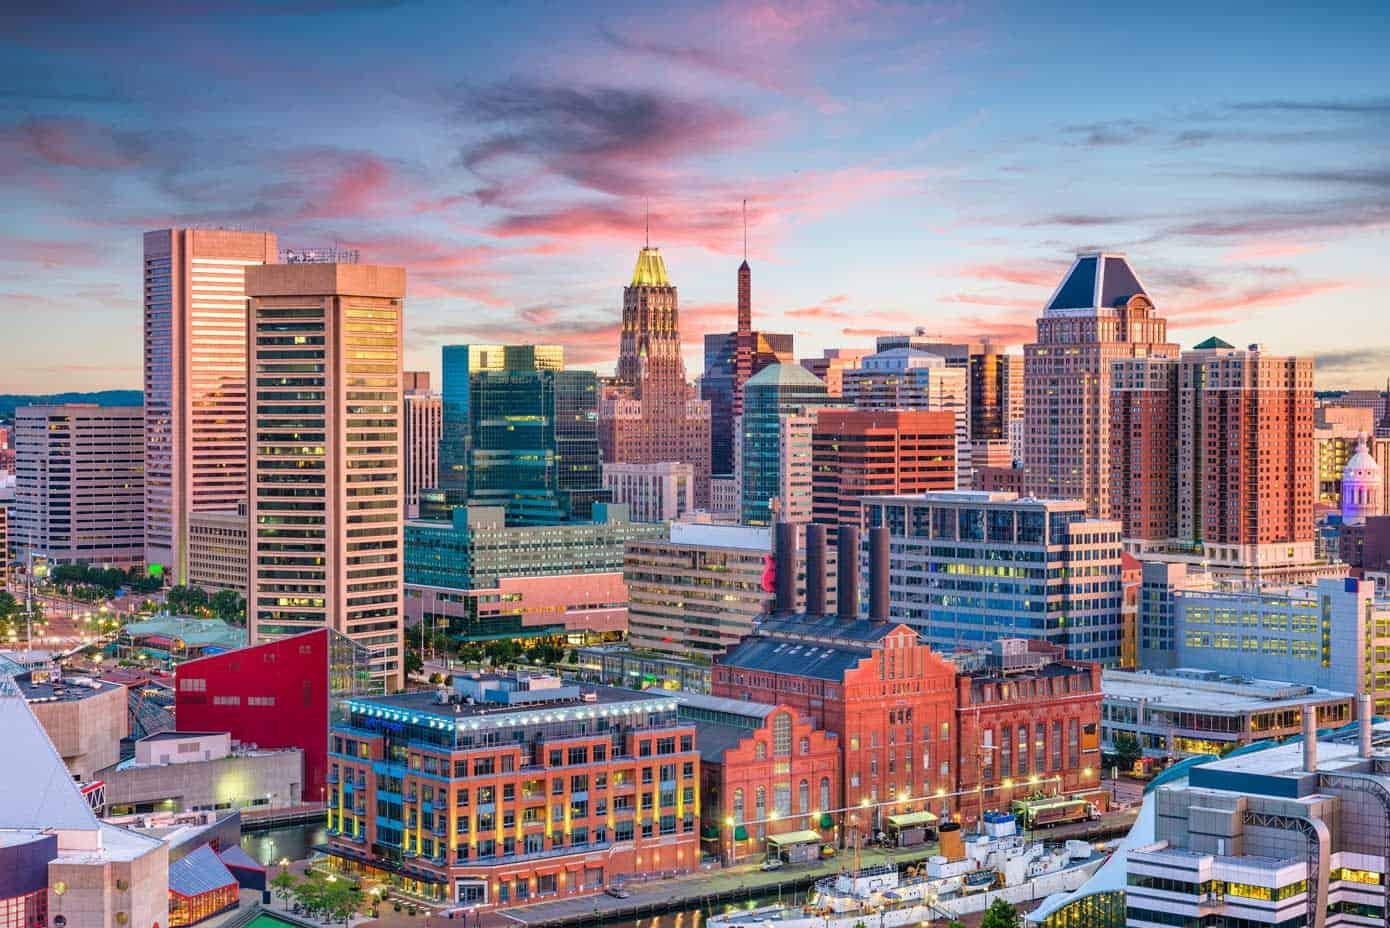 The Baltimore, Maryland city skyline.